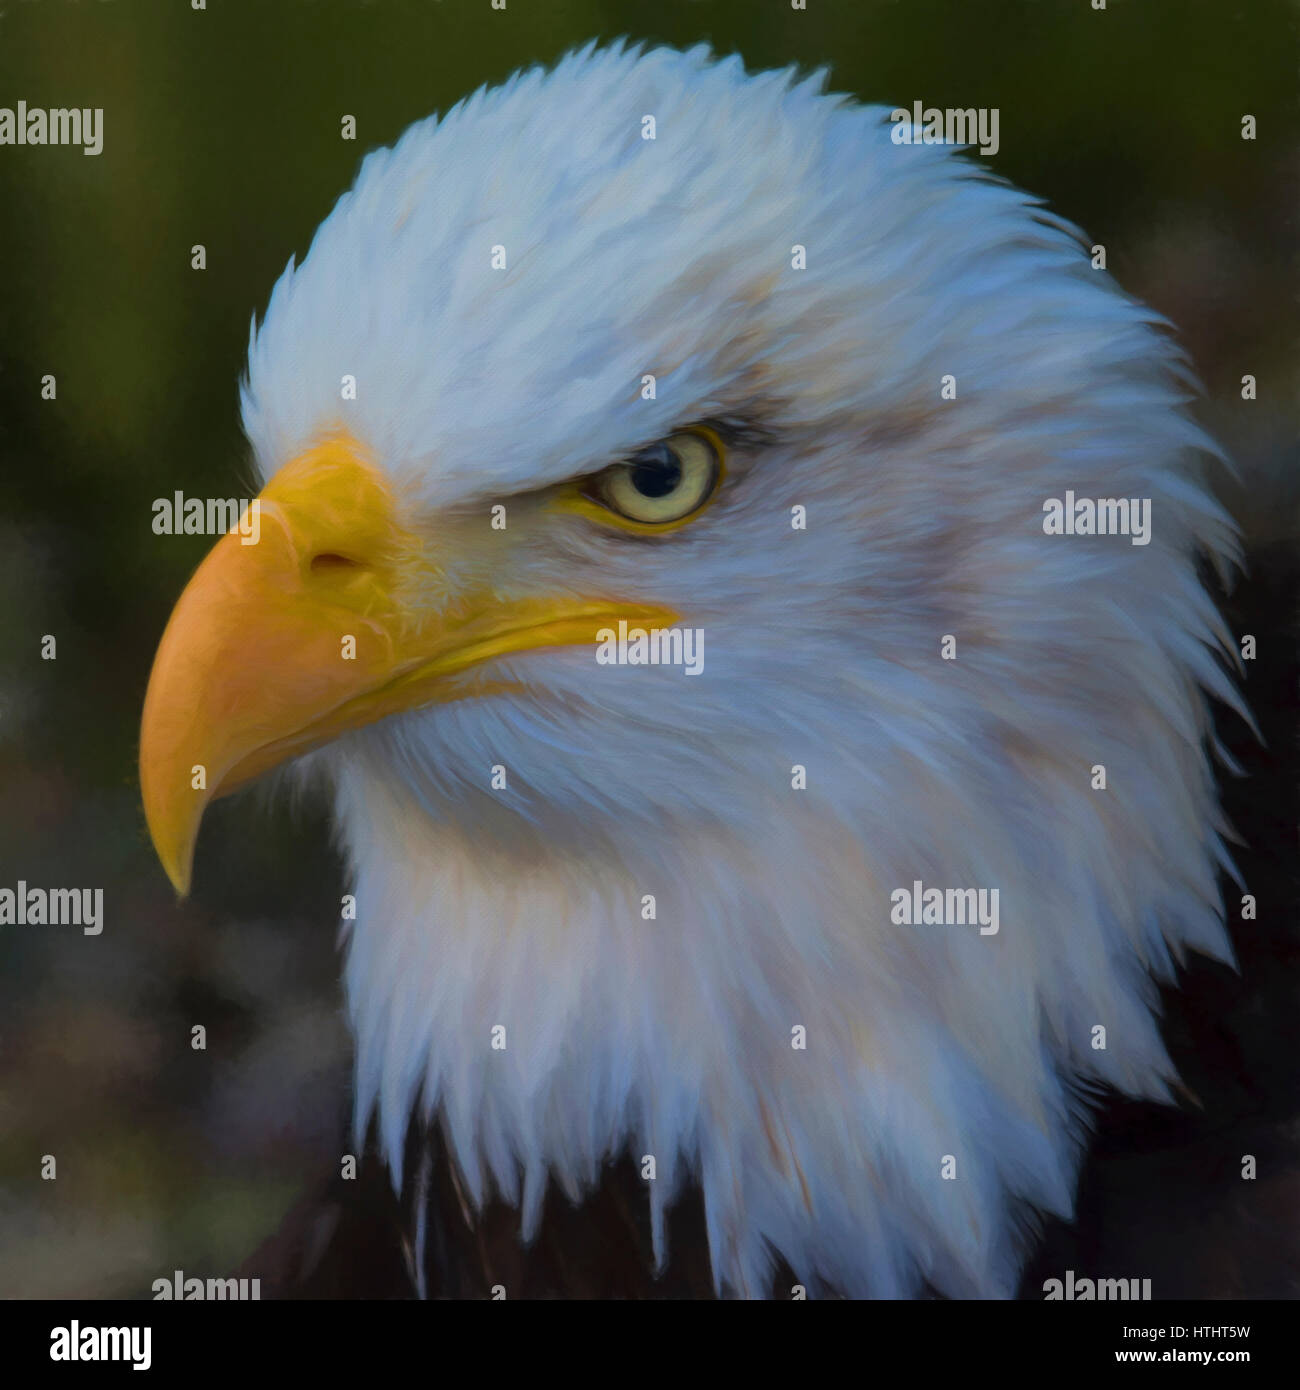 American Bald Eagle - Stock Image